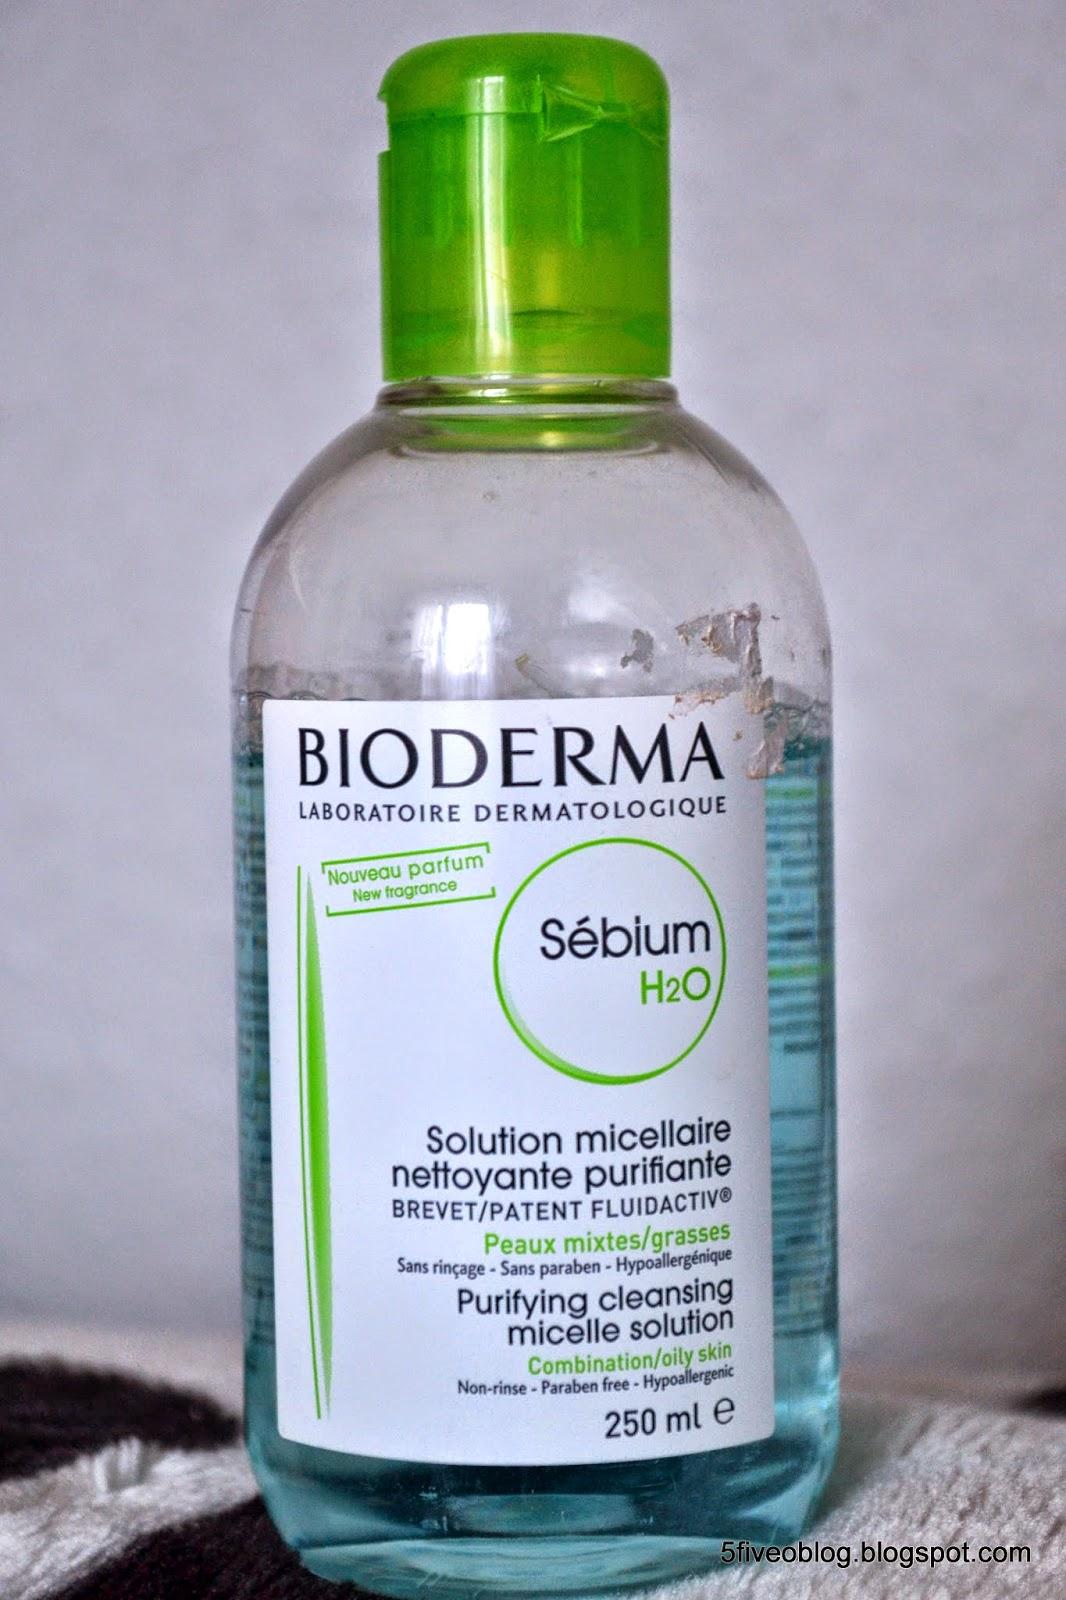 Bioderma - Sebium H2O. Antybakteryjny micel.